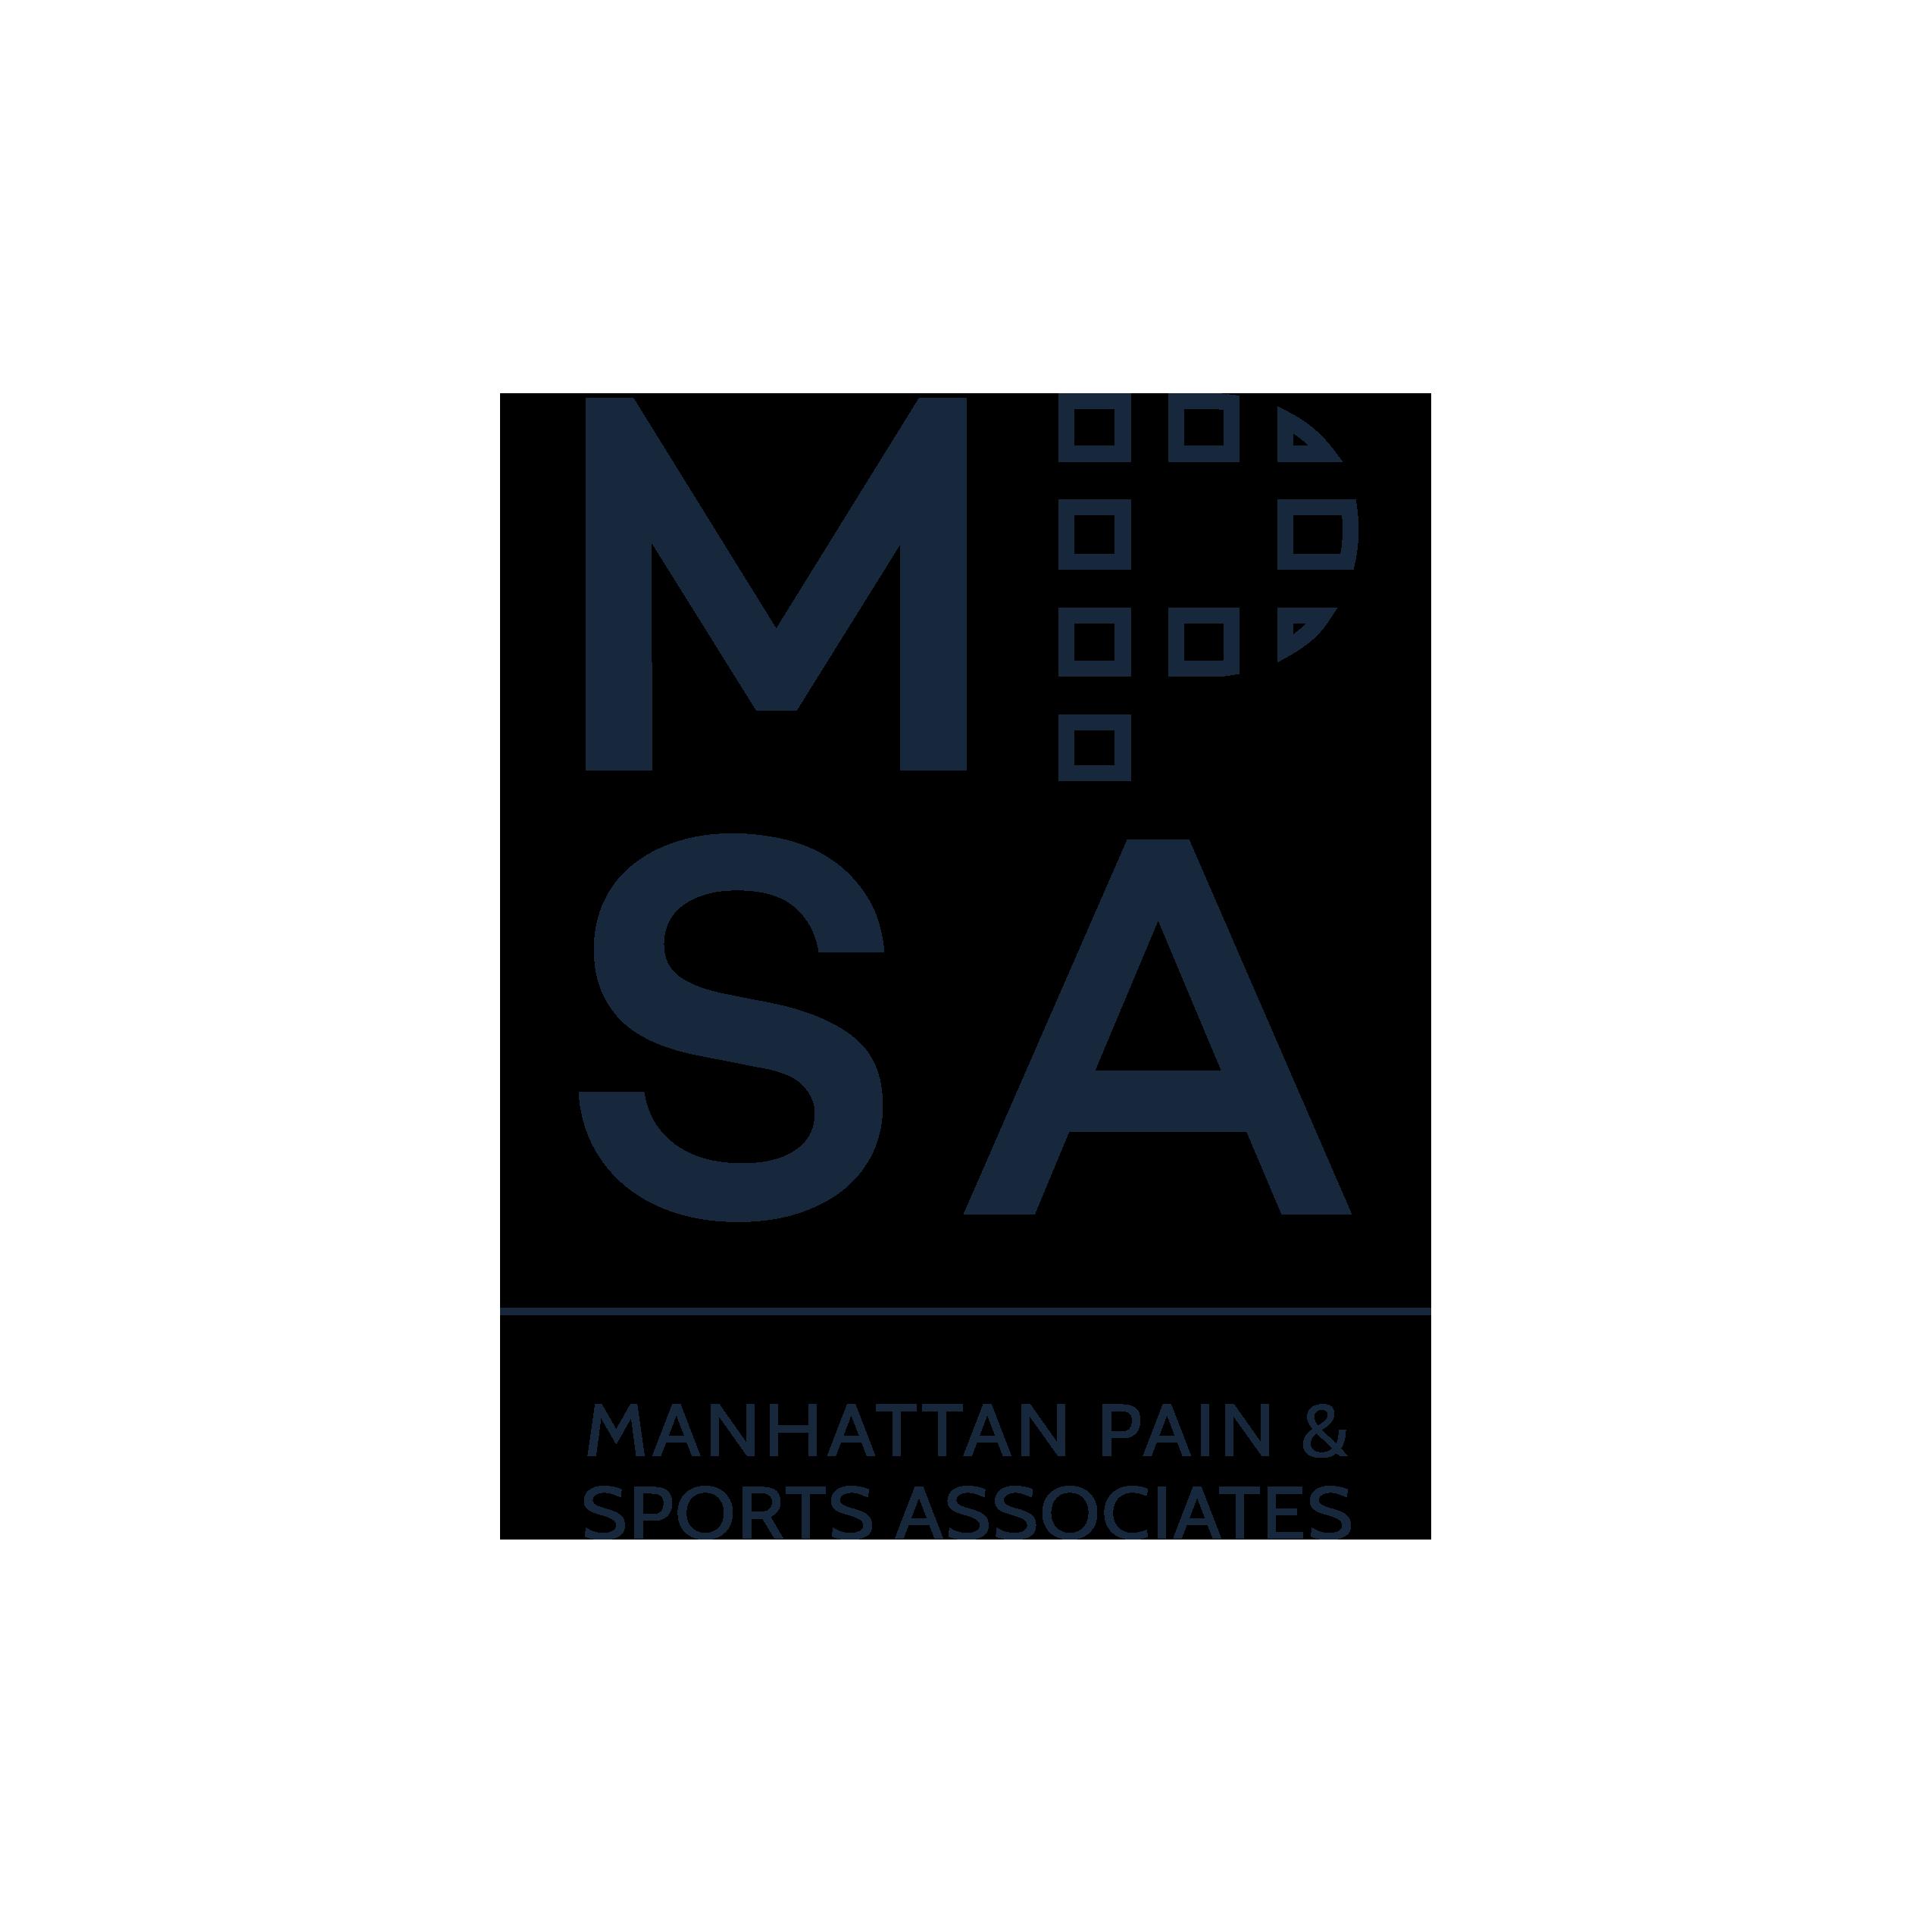 Manhattan Pain & Sports Associates - New York, NY - Alternative Medicine